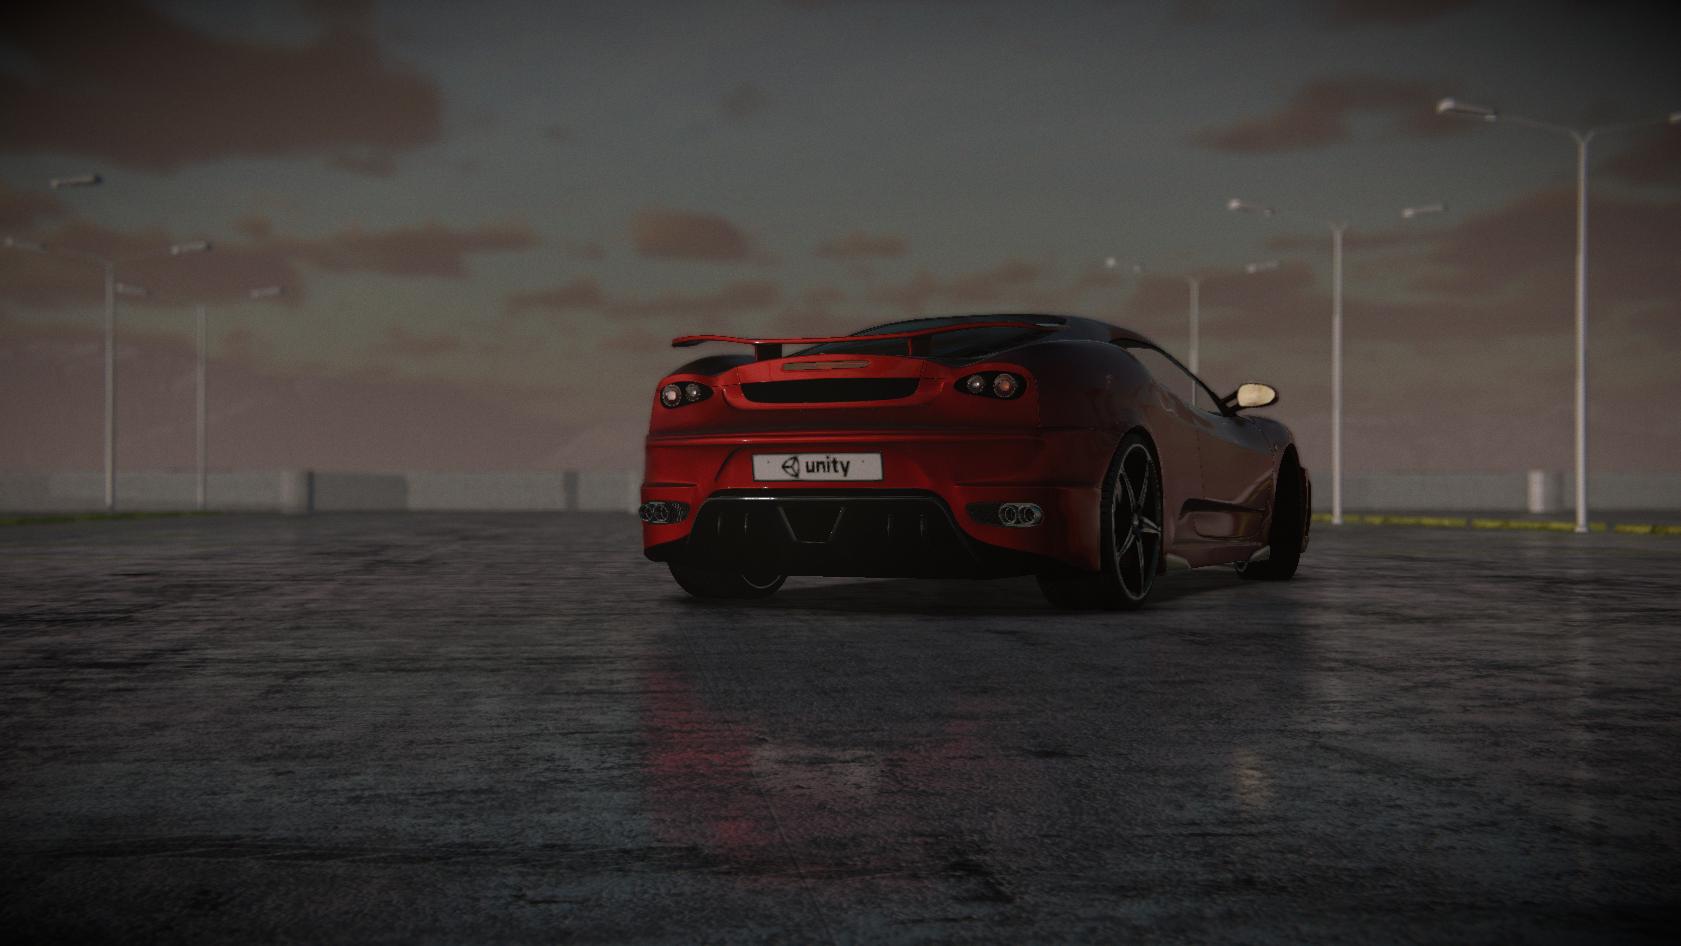 David Miranda: Car rendering: Delving into details